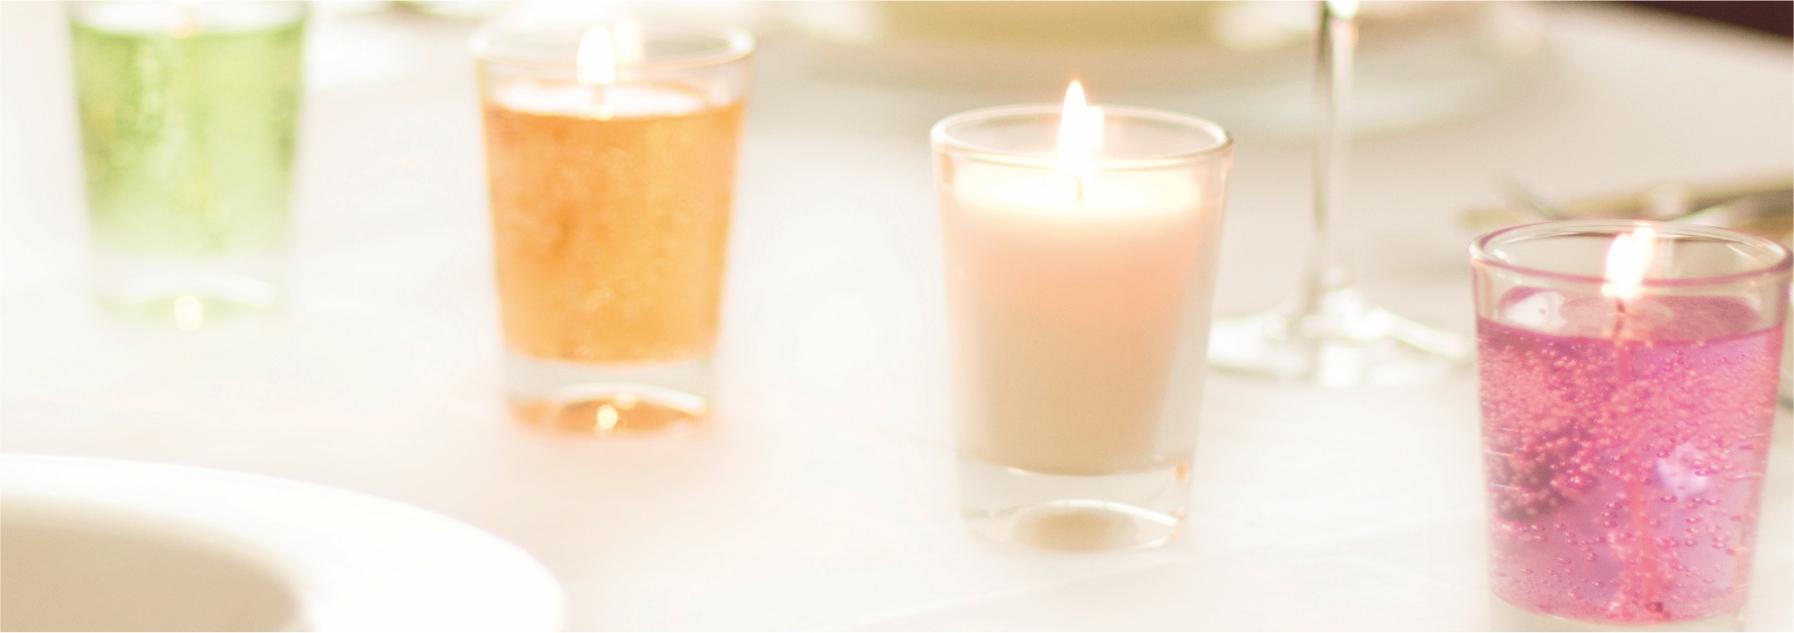 Kerzen in Gläsern